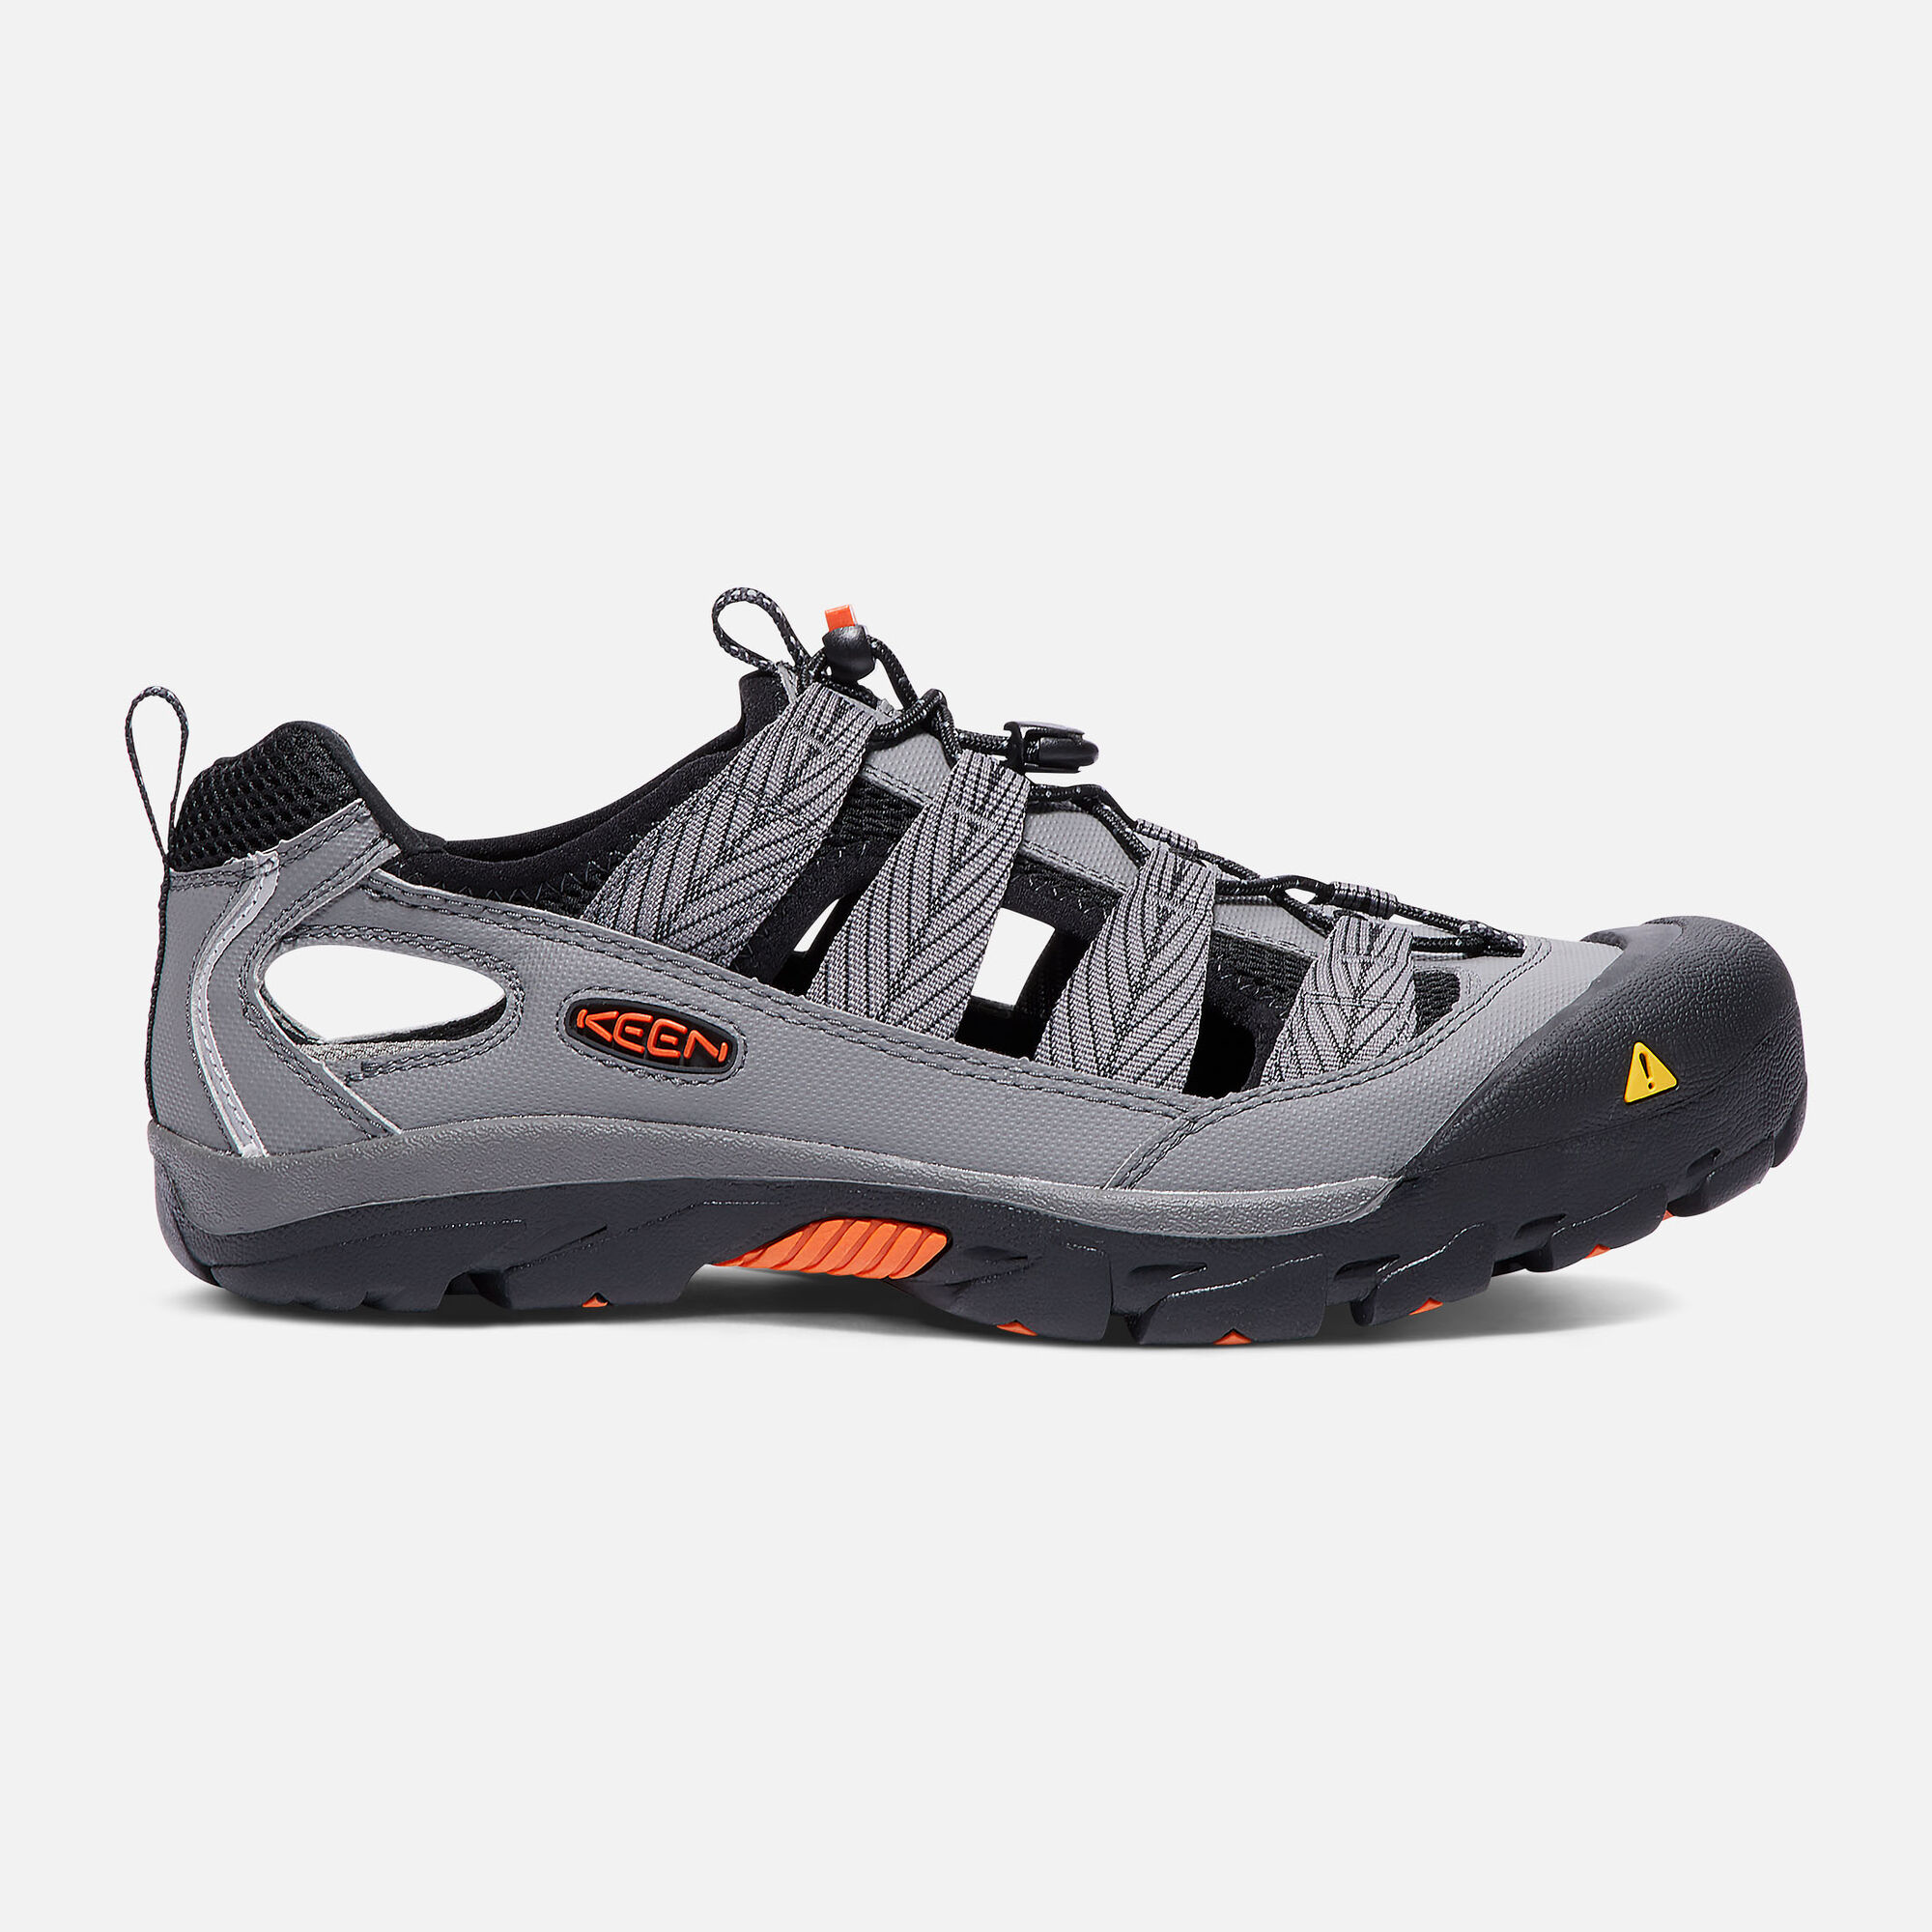 Sandals cycling shoes - Men S Commuter Iv Bike Sandal In Gargoyle Koi Small View